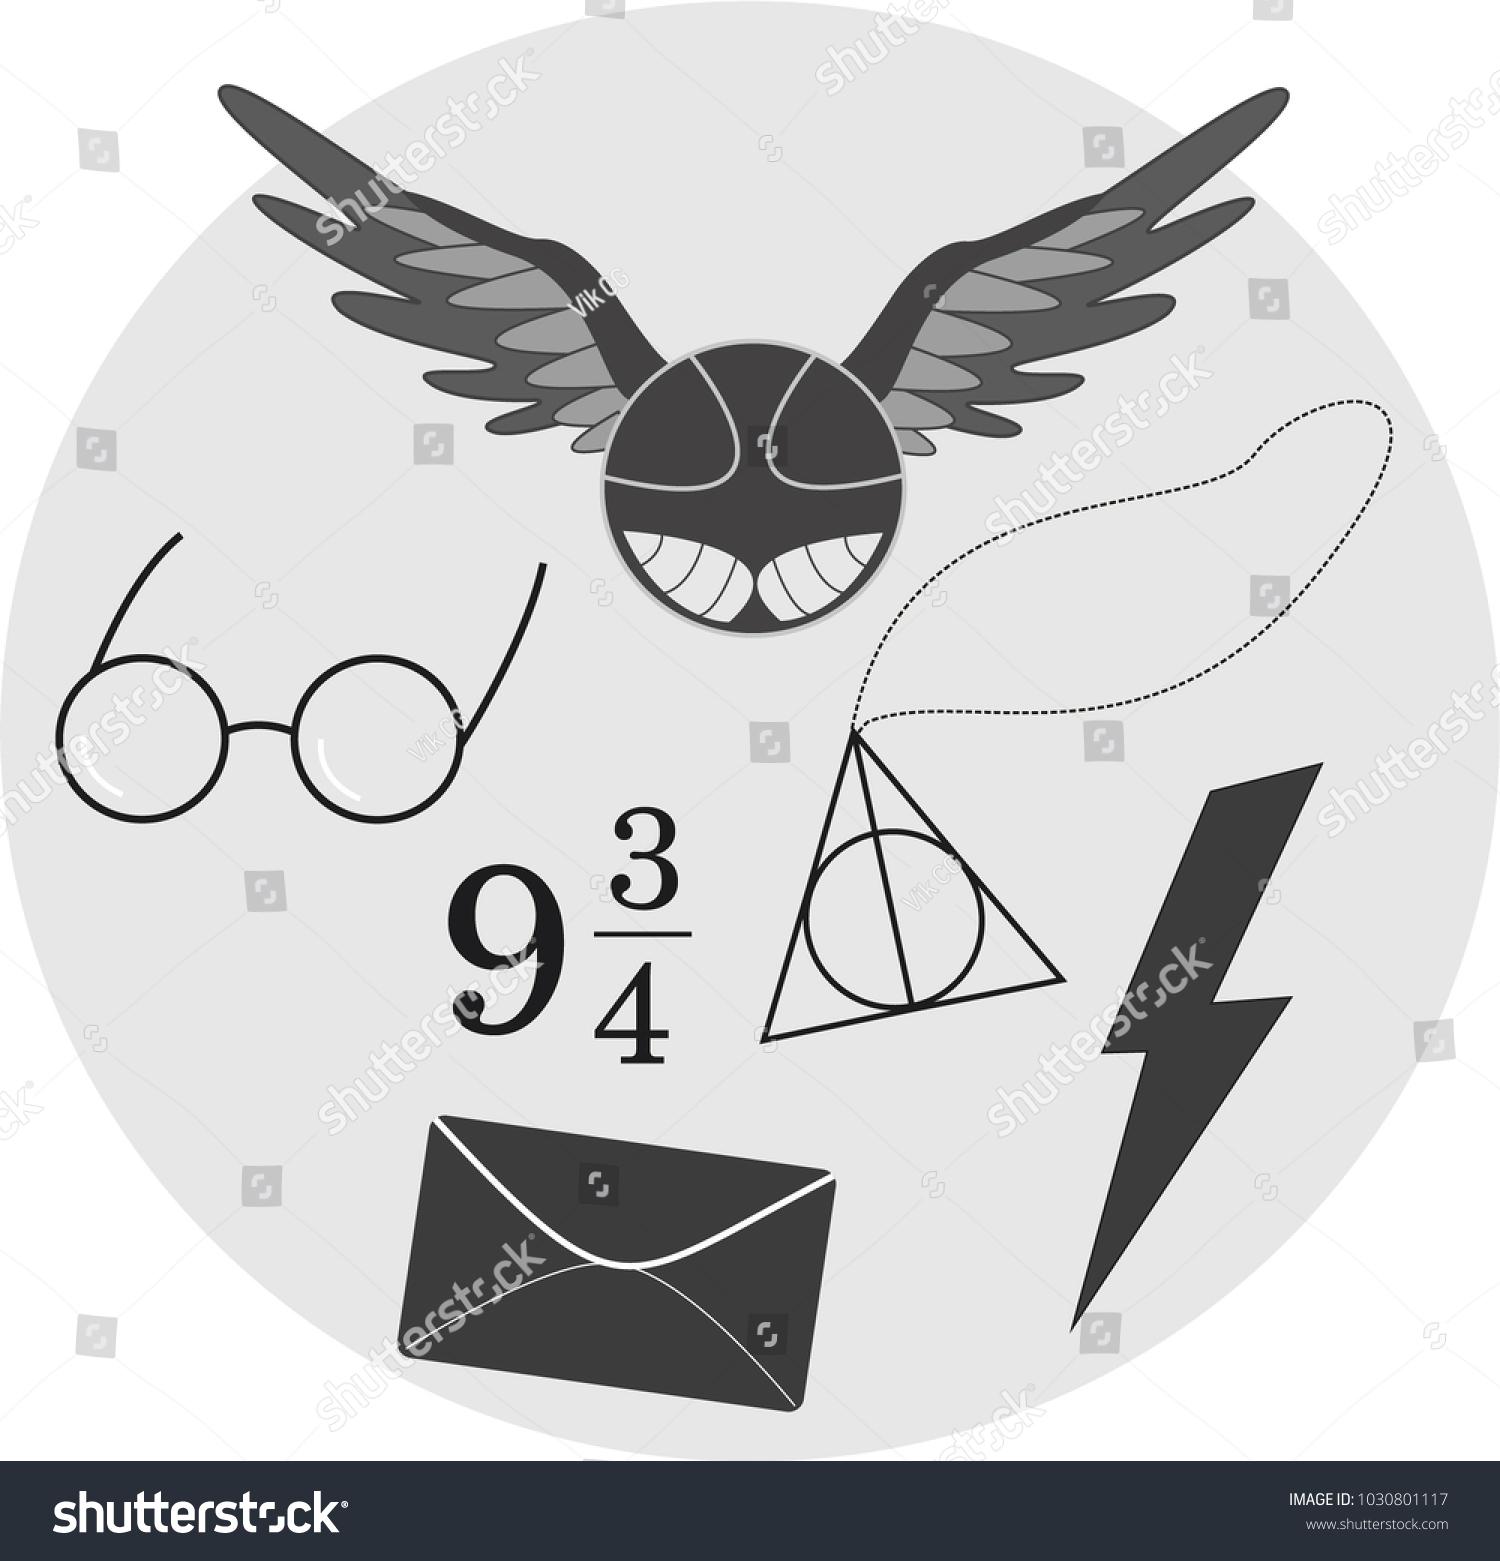 80eb86073358a Harry Potter Icons Hogwarts Magic Stock Vector (Royalty Free ...